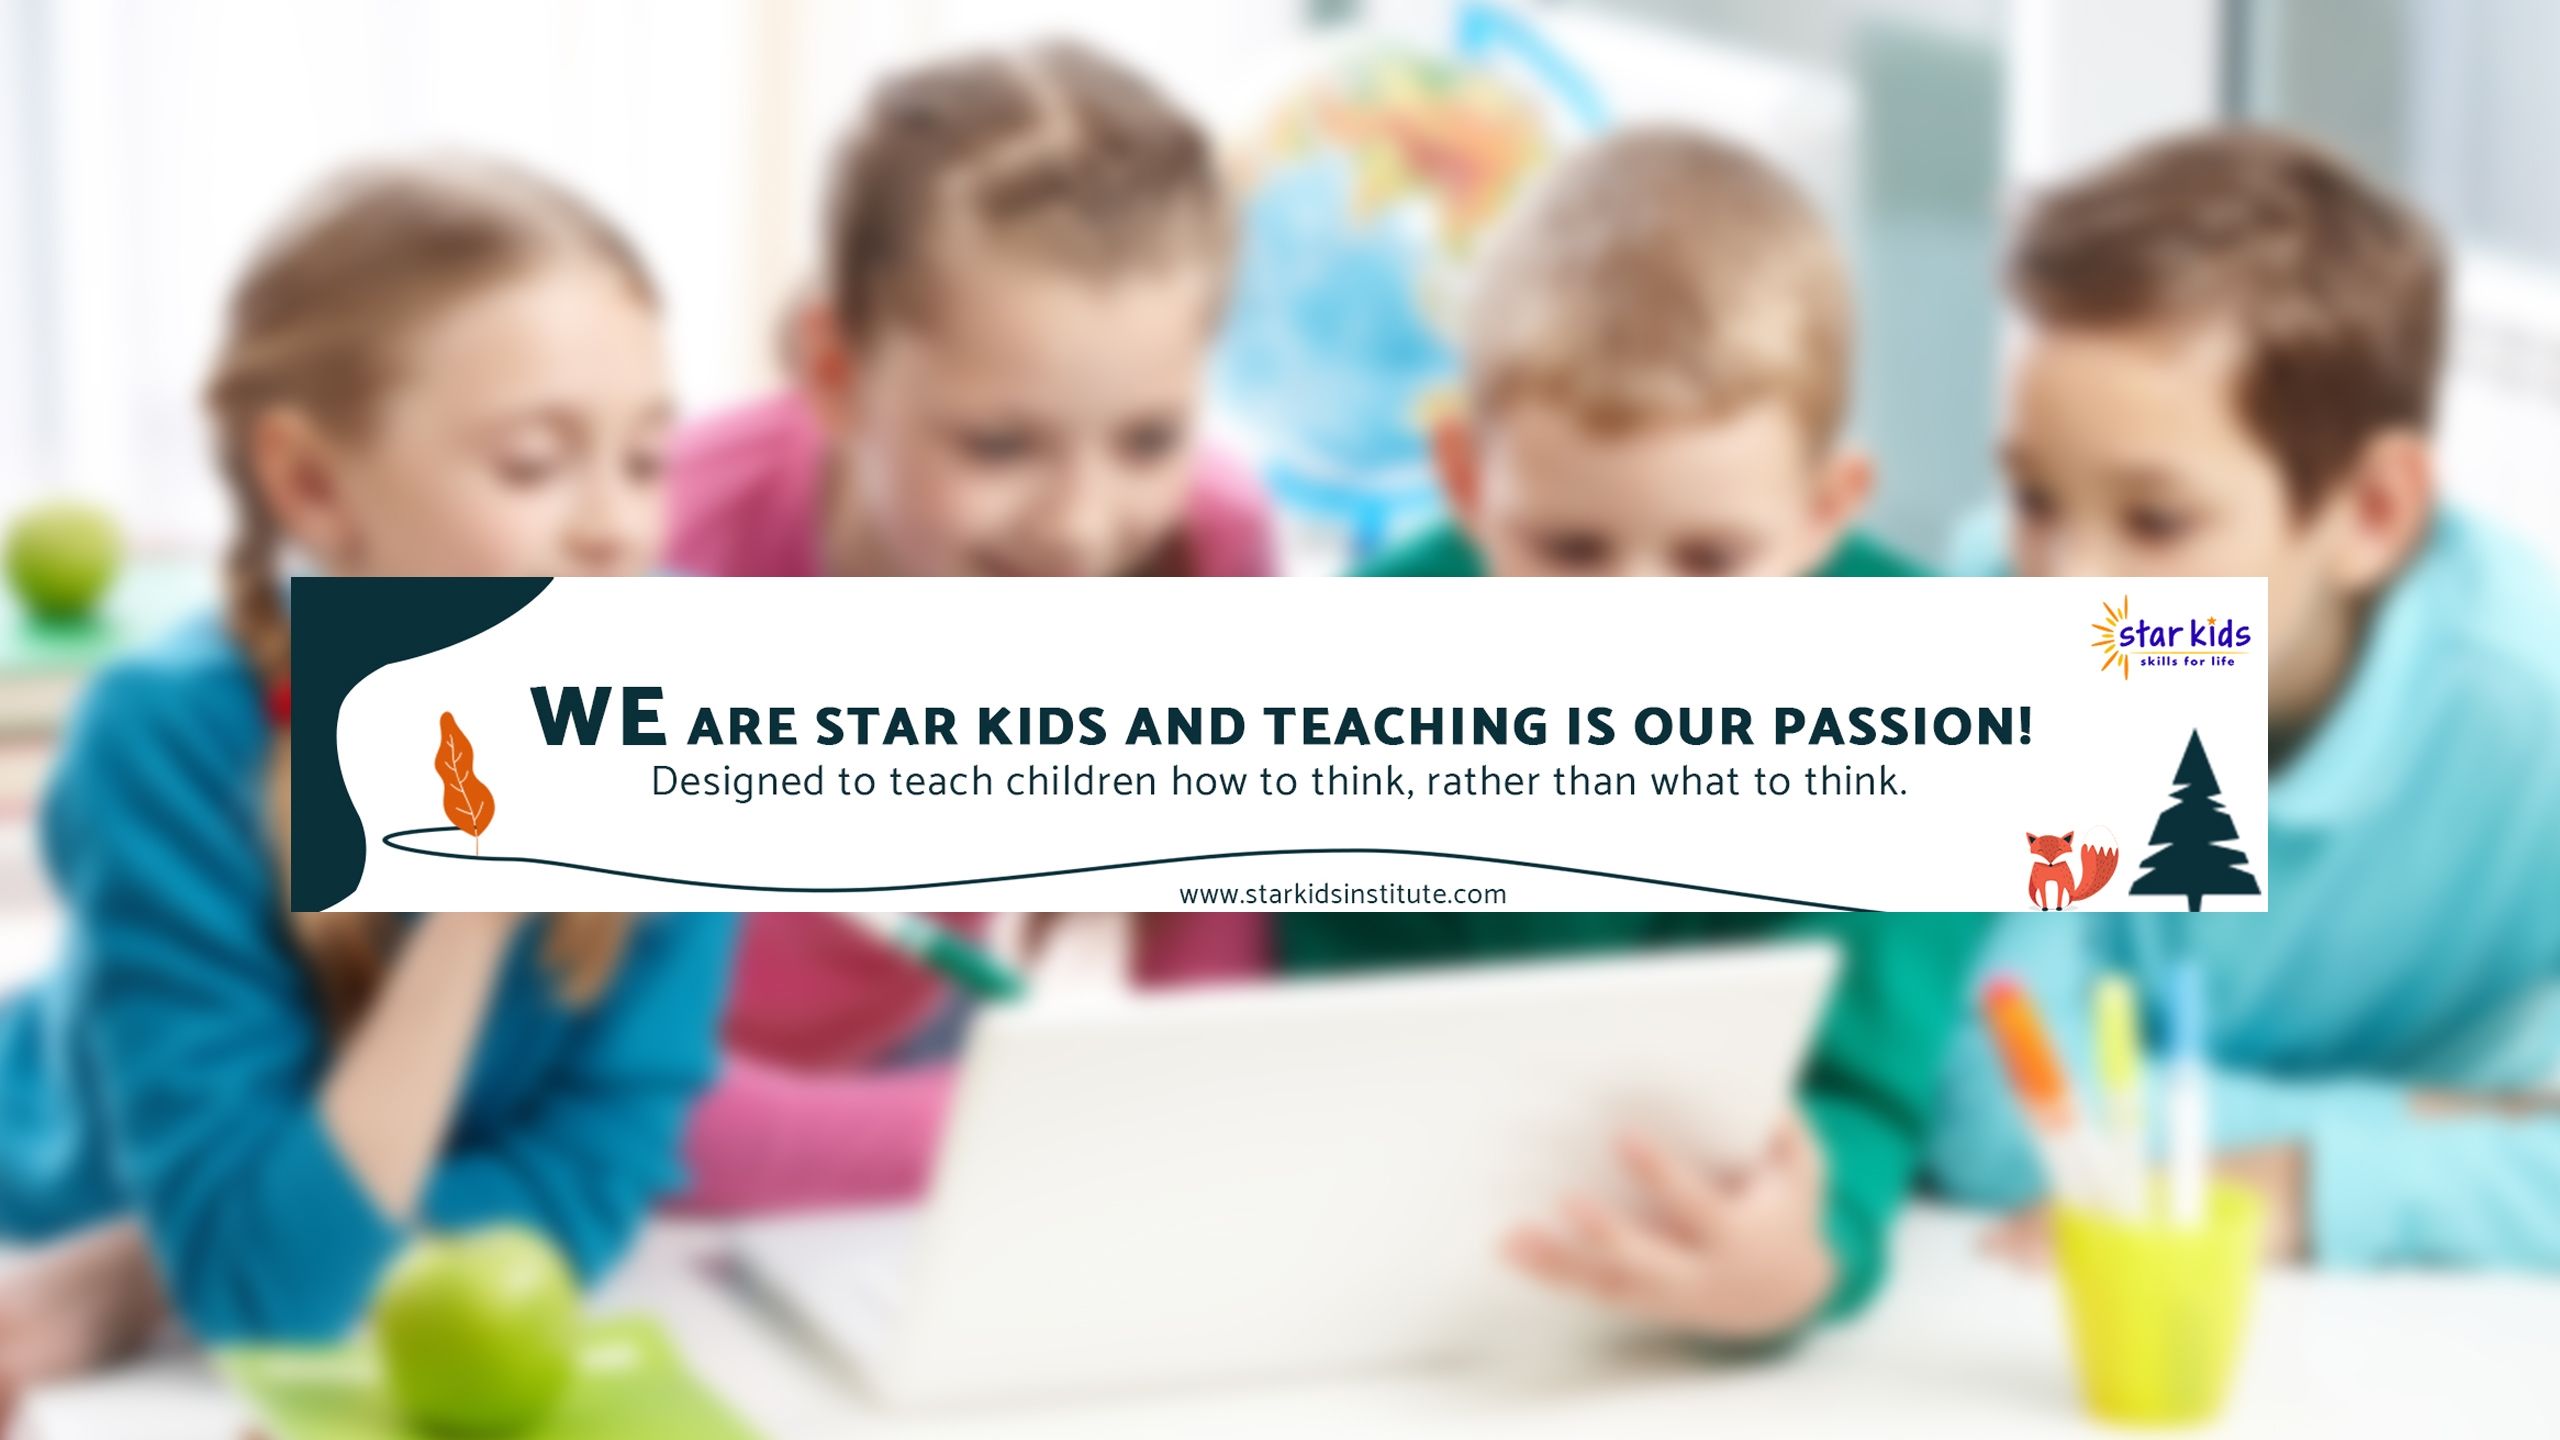 Star Kids for CHildren Development (@starkids) Cover Image